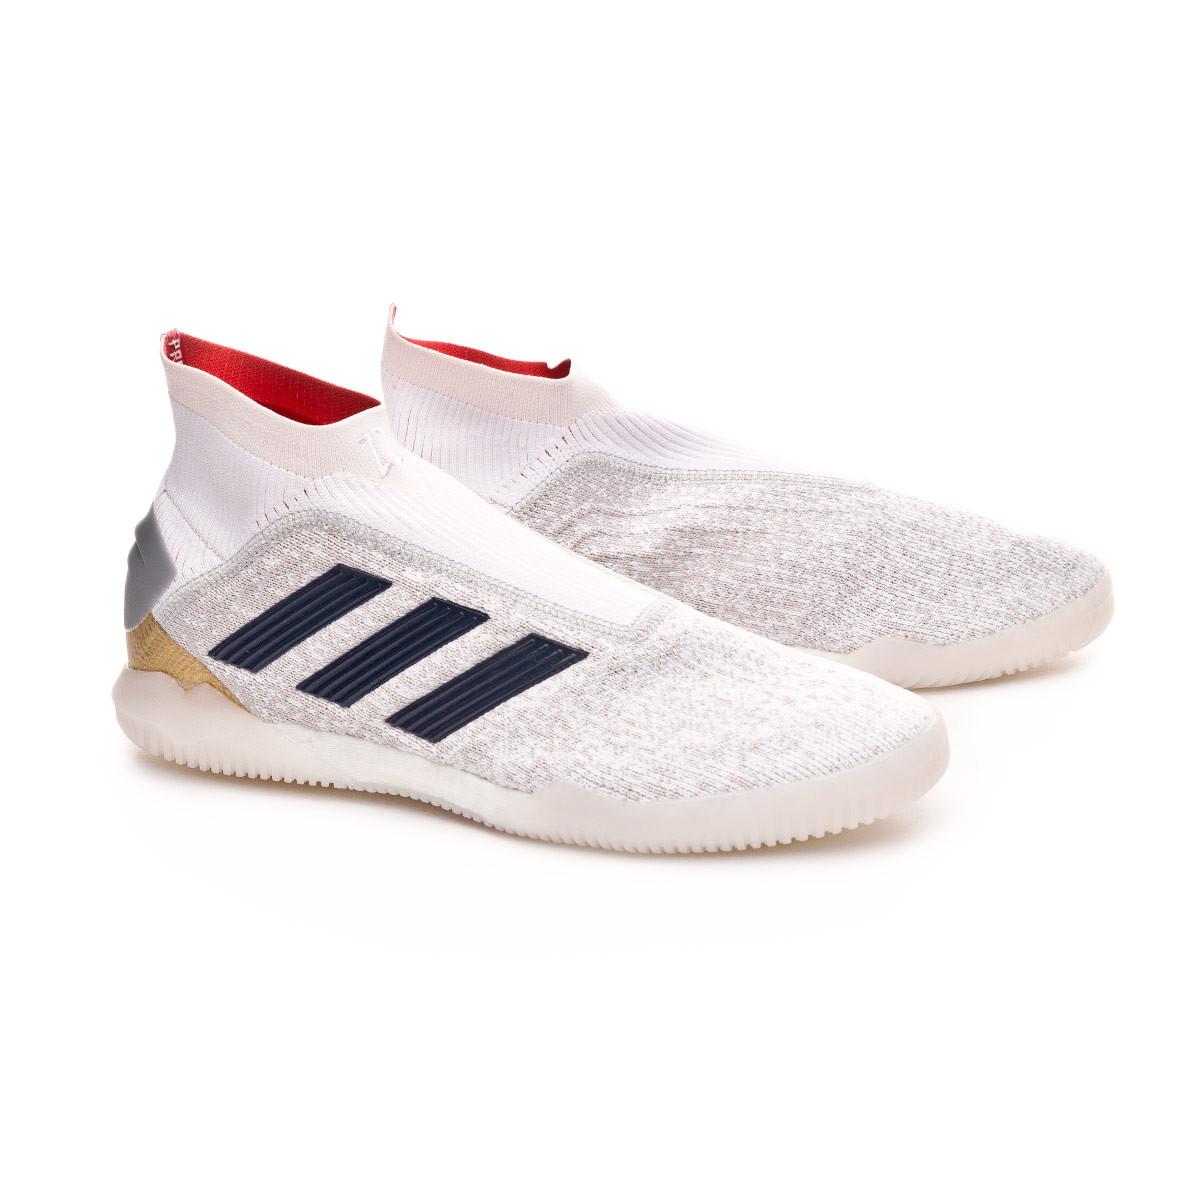 b435a45ba88b8 Tenis adidas Predator Tango 19+ TR DB White-Silver metallic-Predator Red -  Tienda de fútbol Fútbol Emotion